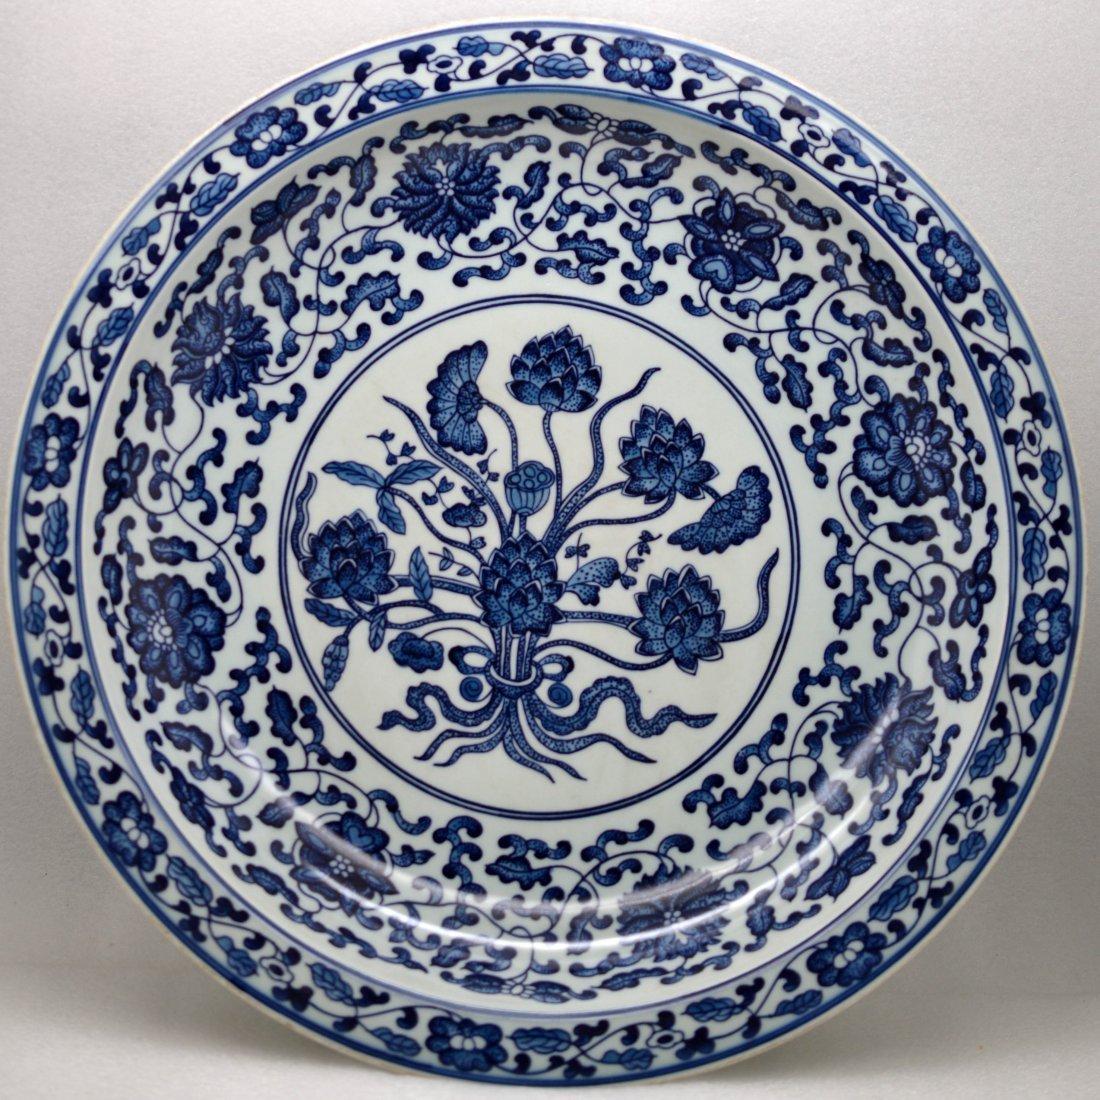 Large Marked Blue & White Porcelain Lotus Plate